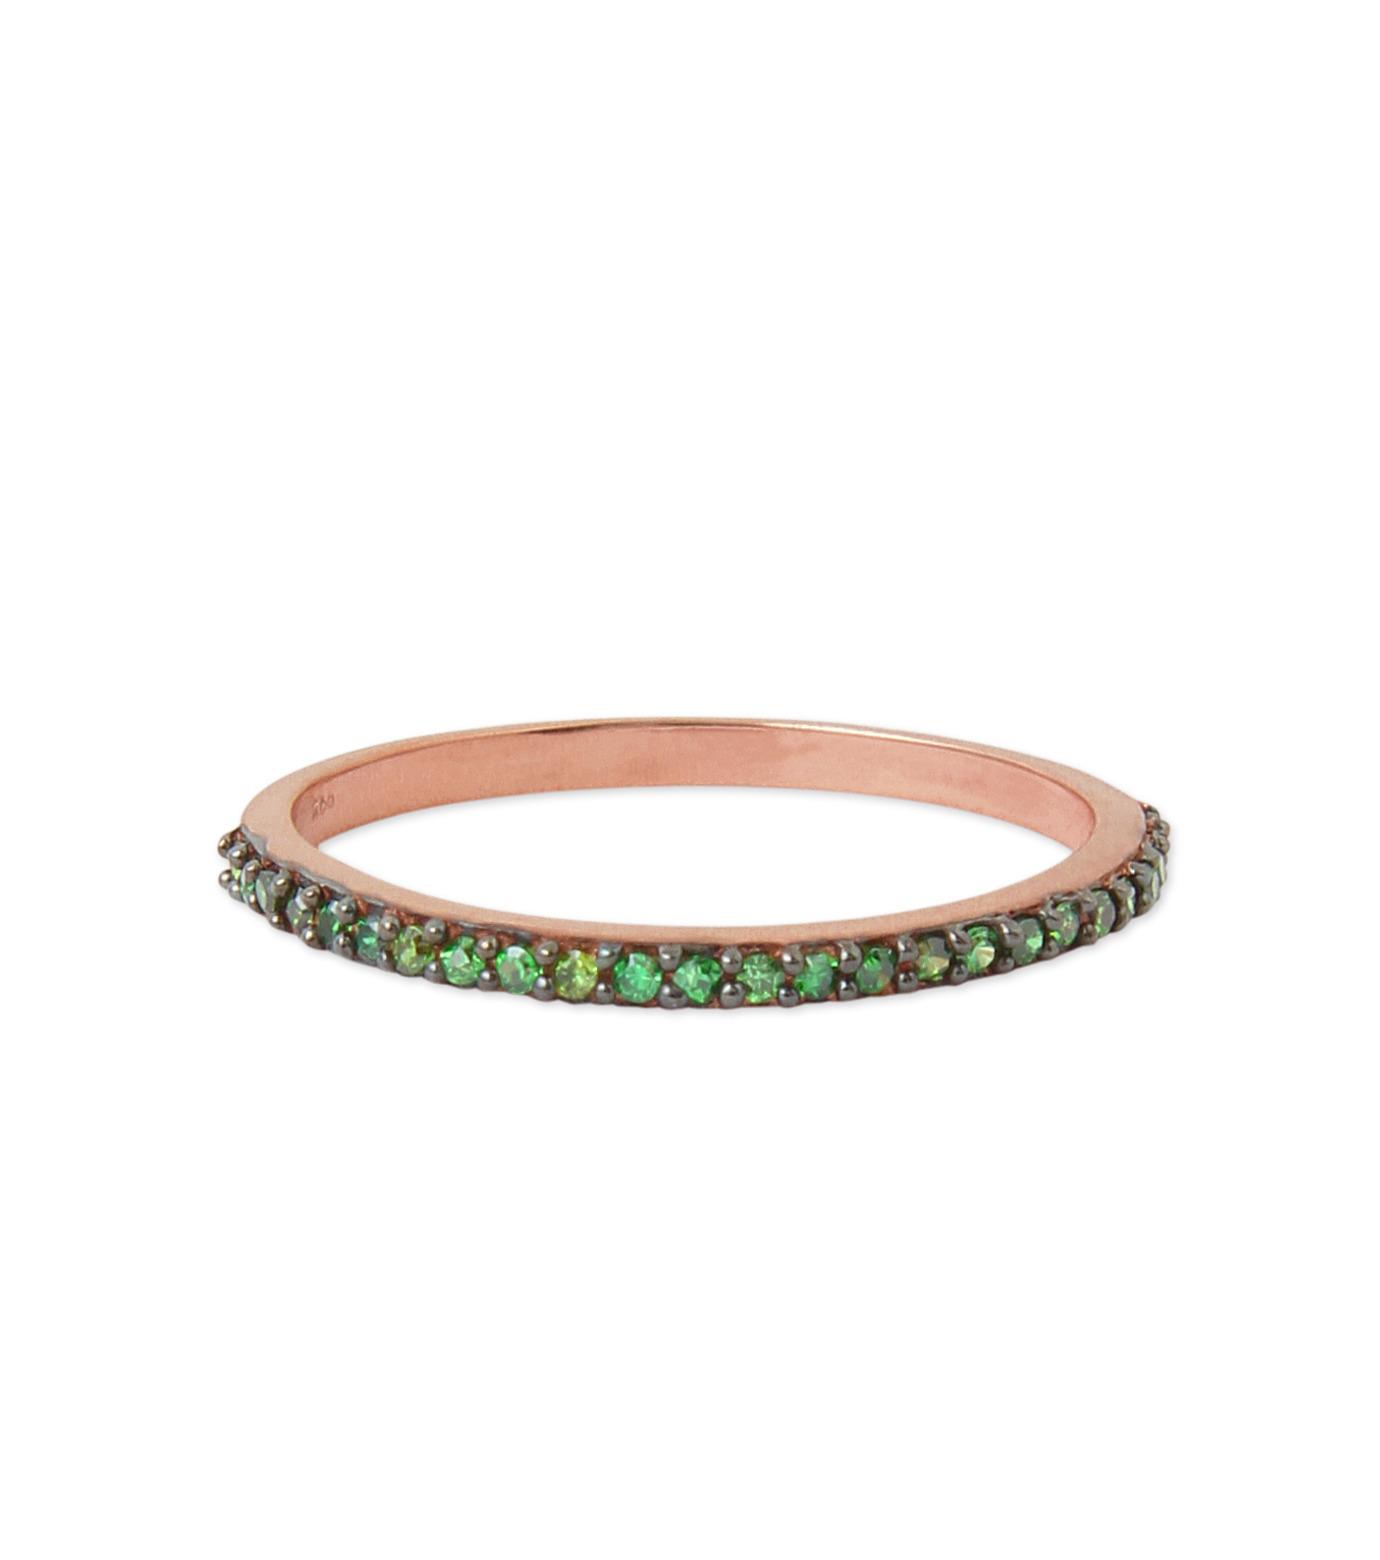 Priyanka(プリヤンカ)のSolitaire Ring-GREEN(リング/ring)-FR-004-22 拡大詳細画像1